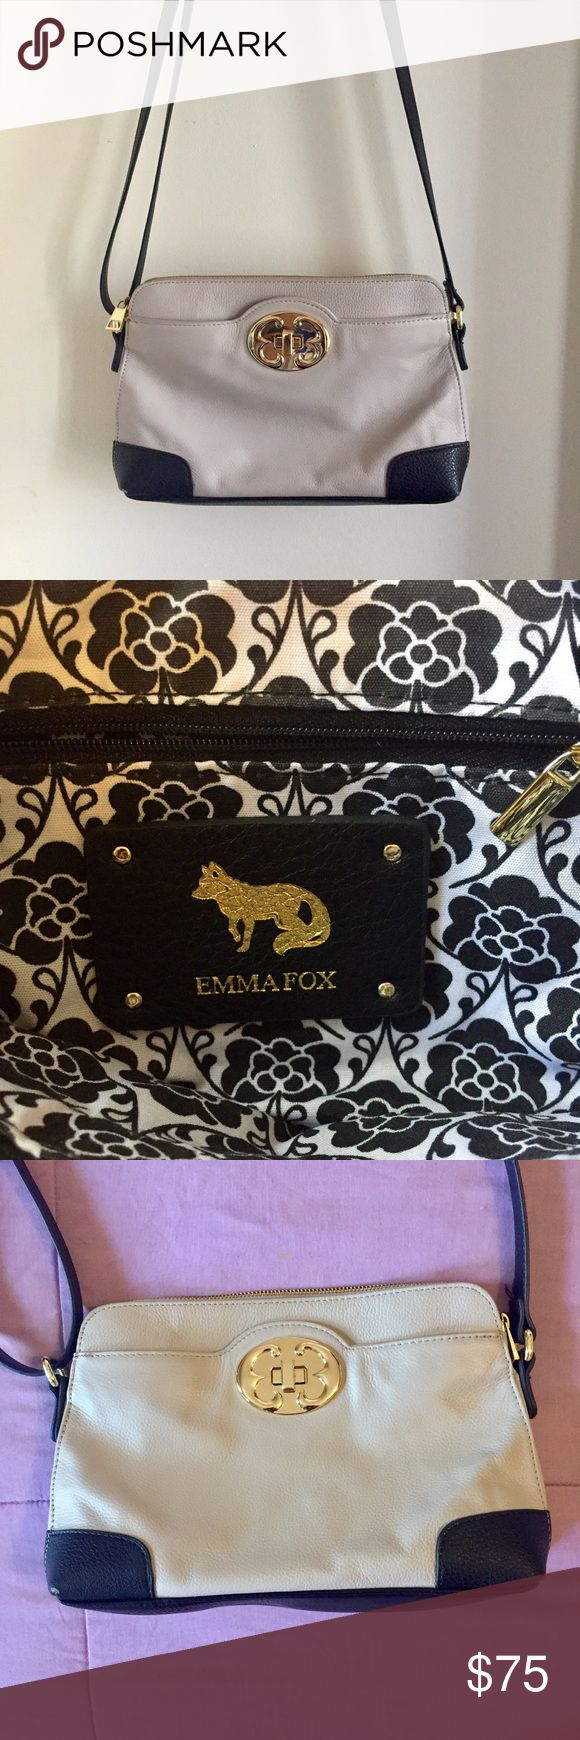 Emma Fox Leather Cross-body Handbag Tan and black leather cross body bag with gold buckle and patterned interior. Several pockets inside and outside. Adjustable strap Emma Fox Bags Crossbody Bags